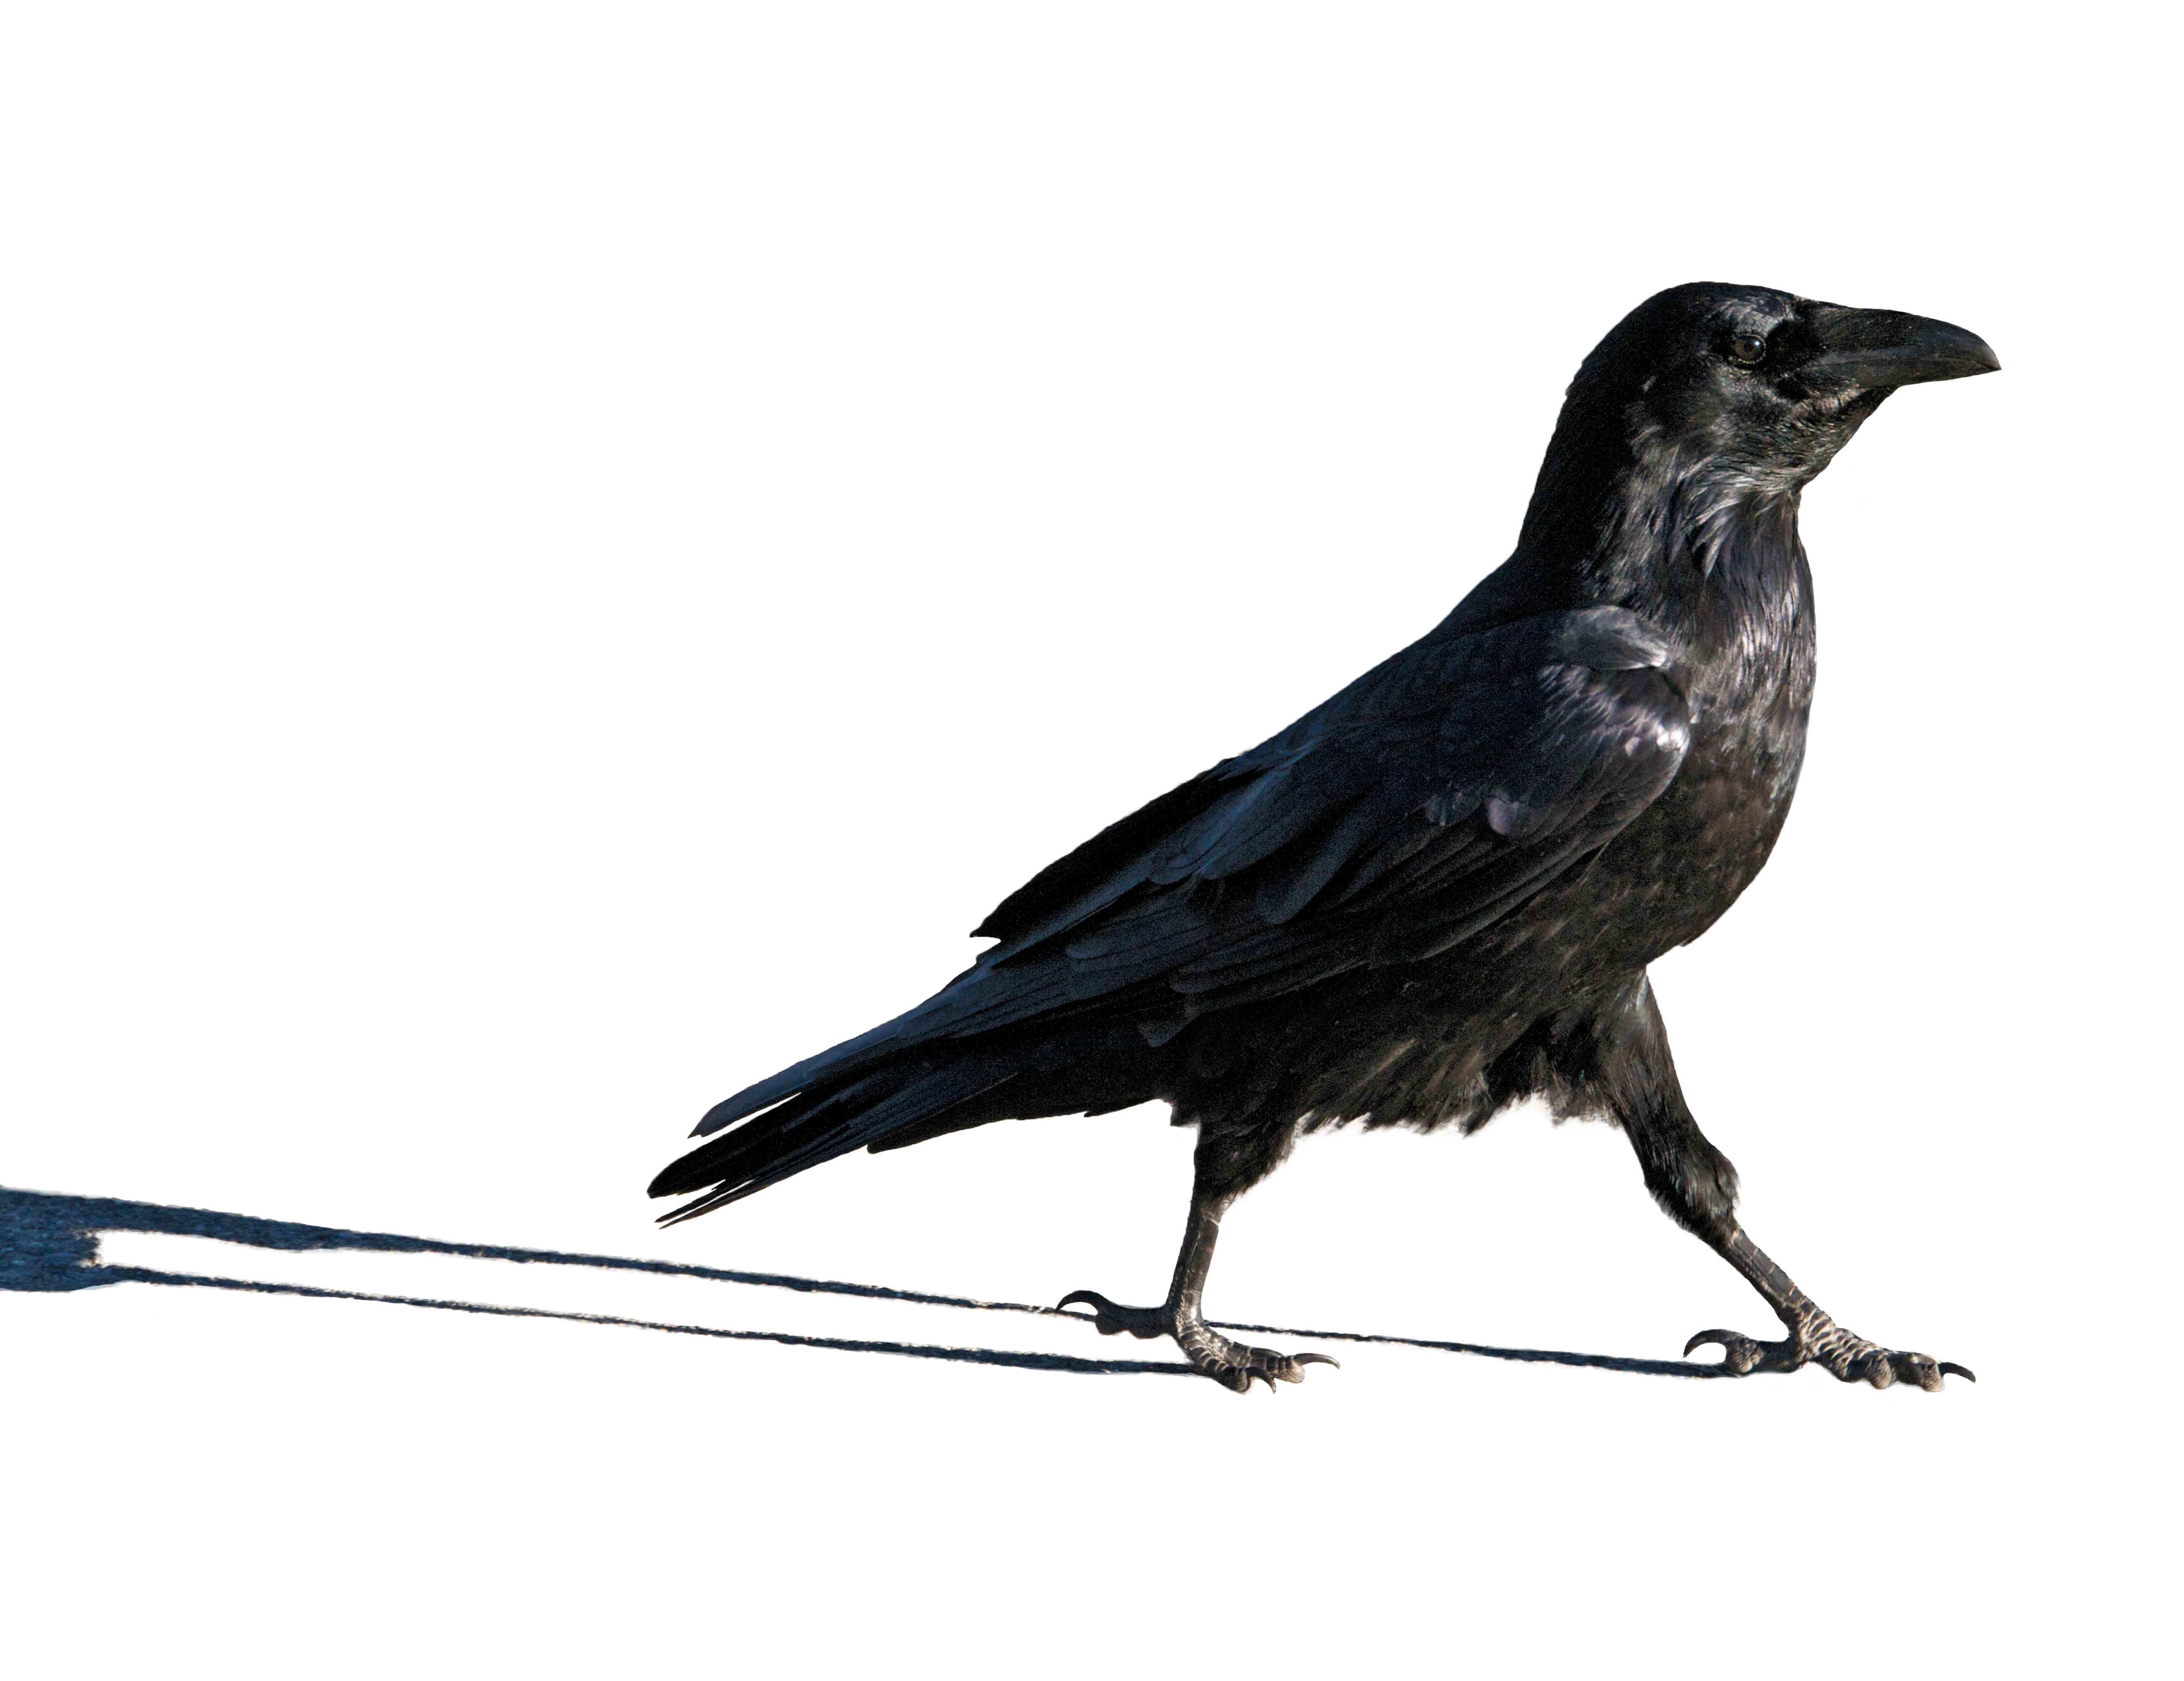 Stride on: this brainiac bird has a right to strut